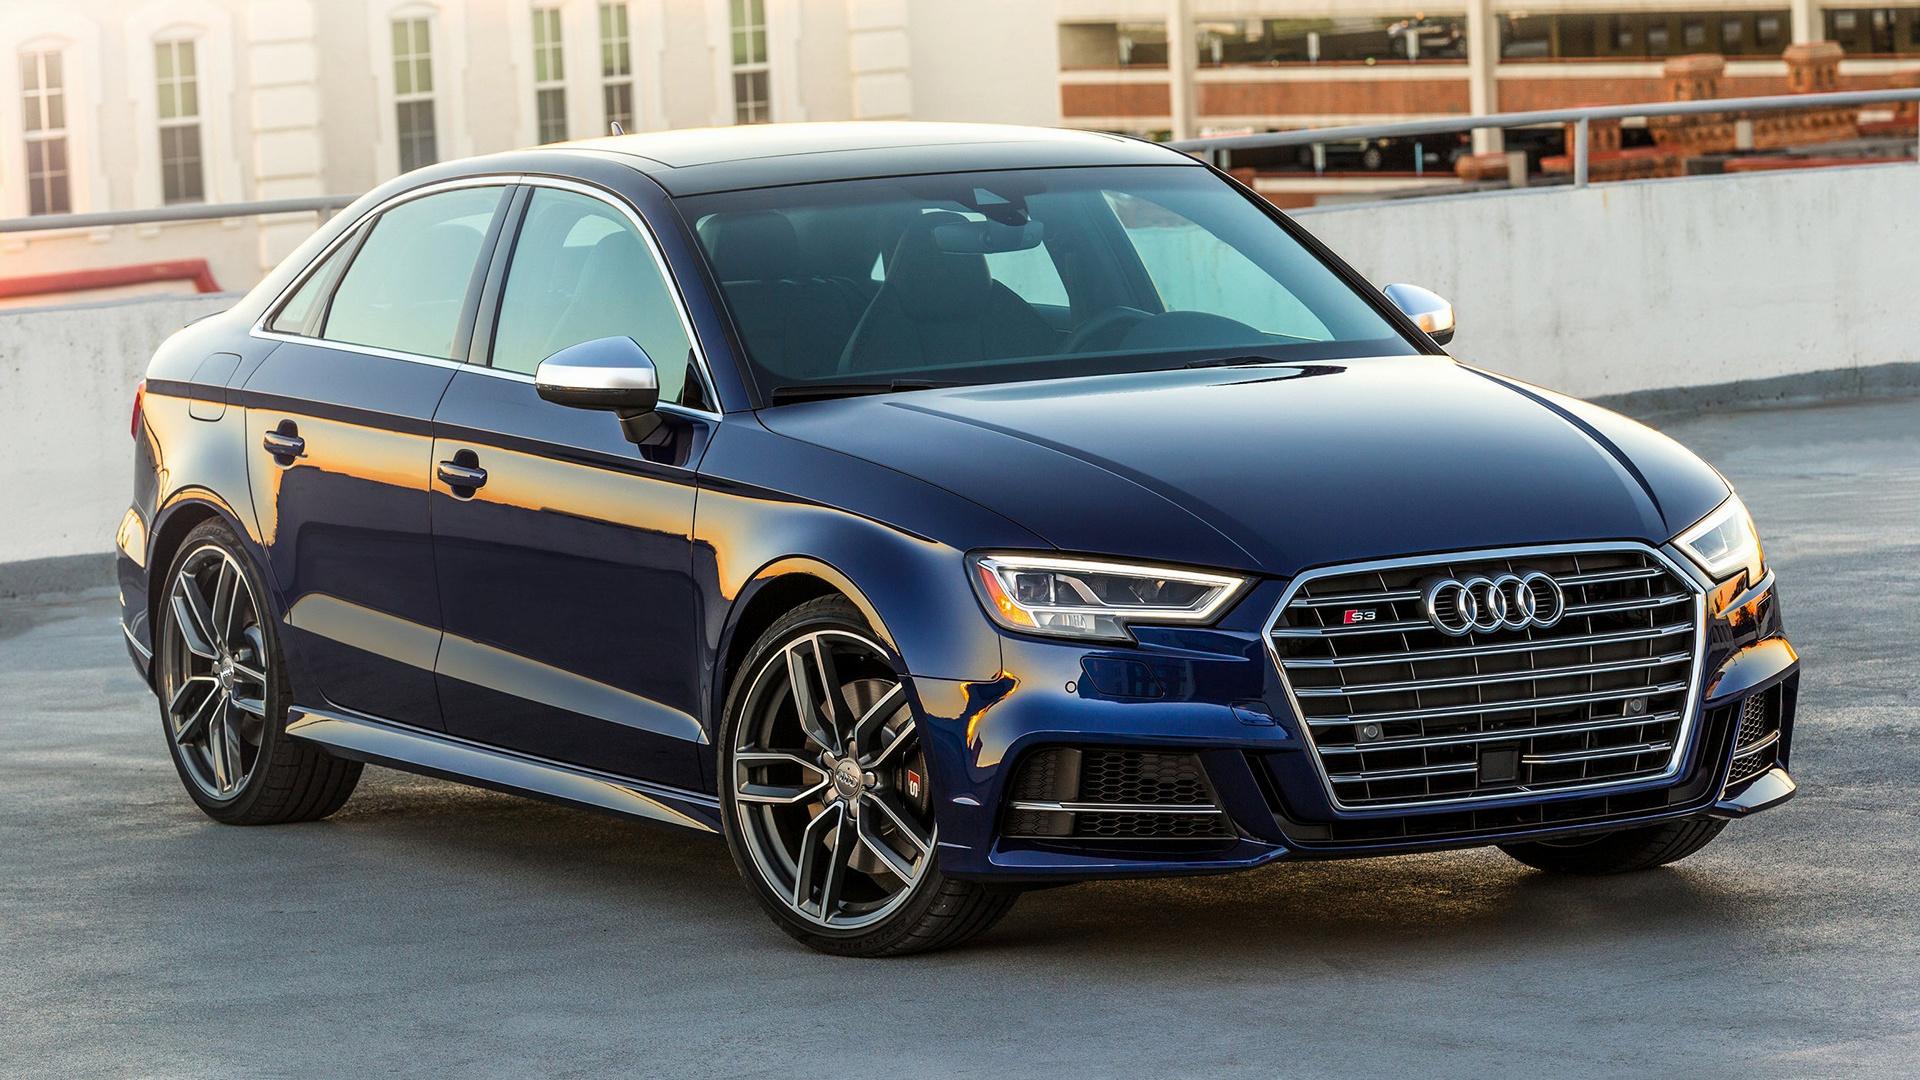 Elegant Audi S3 Wallpaper Hd – Max Pleasure